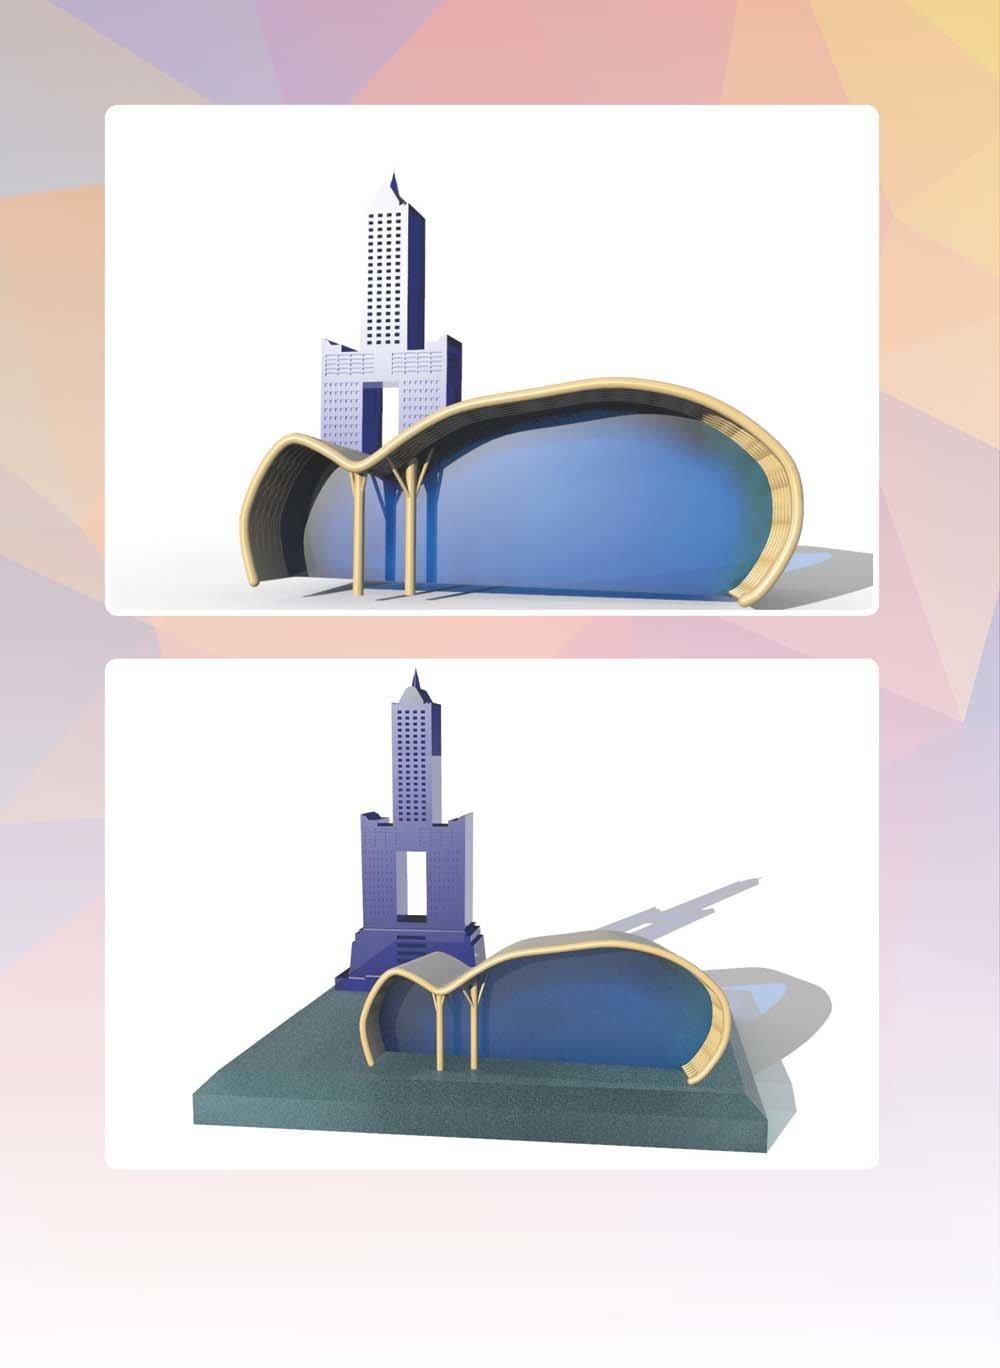 Rhinoceros 6 全攻略:自學設計與 3D建模寶典-preview-5